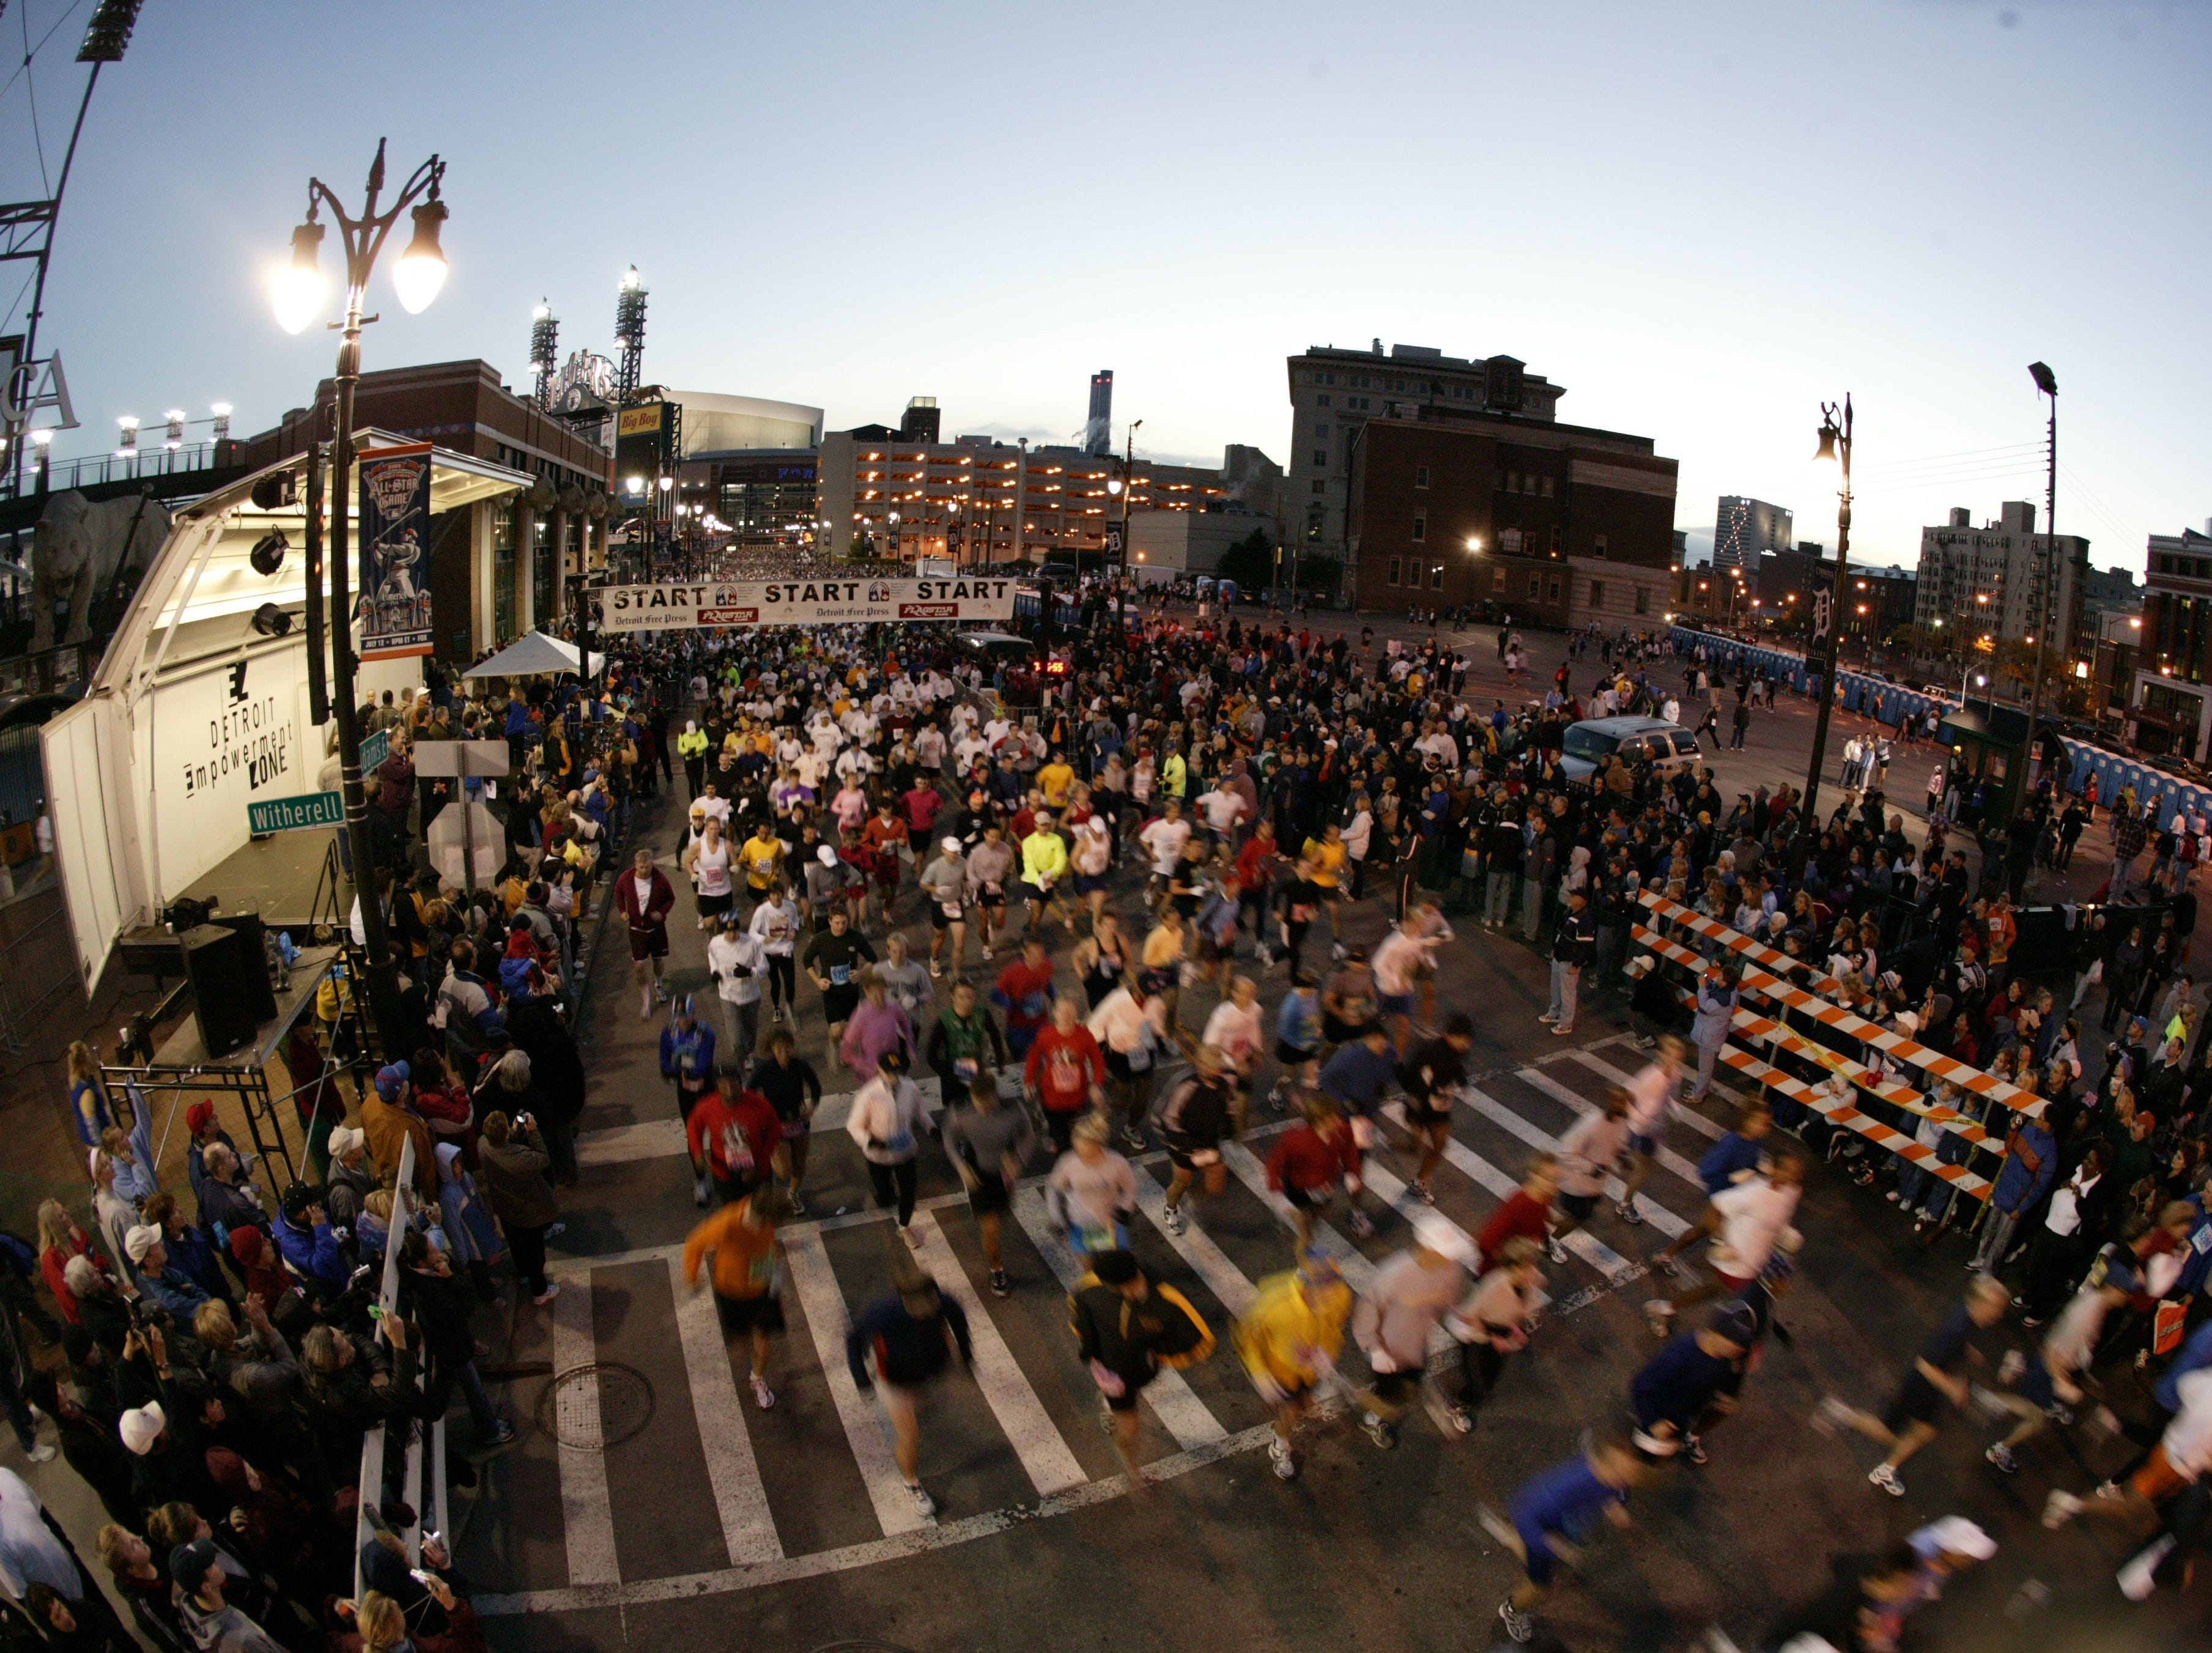 The start line of the 2005 Detroit Free Press/Flagstar Bank Marathon in Detroit, MI on Sunday October 23, 2005.